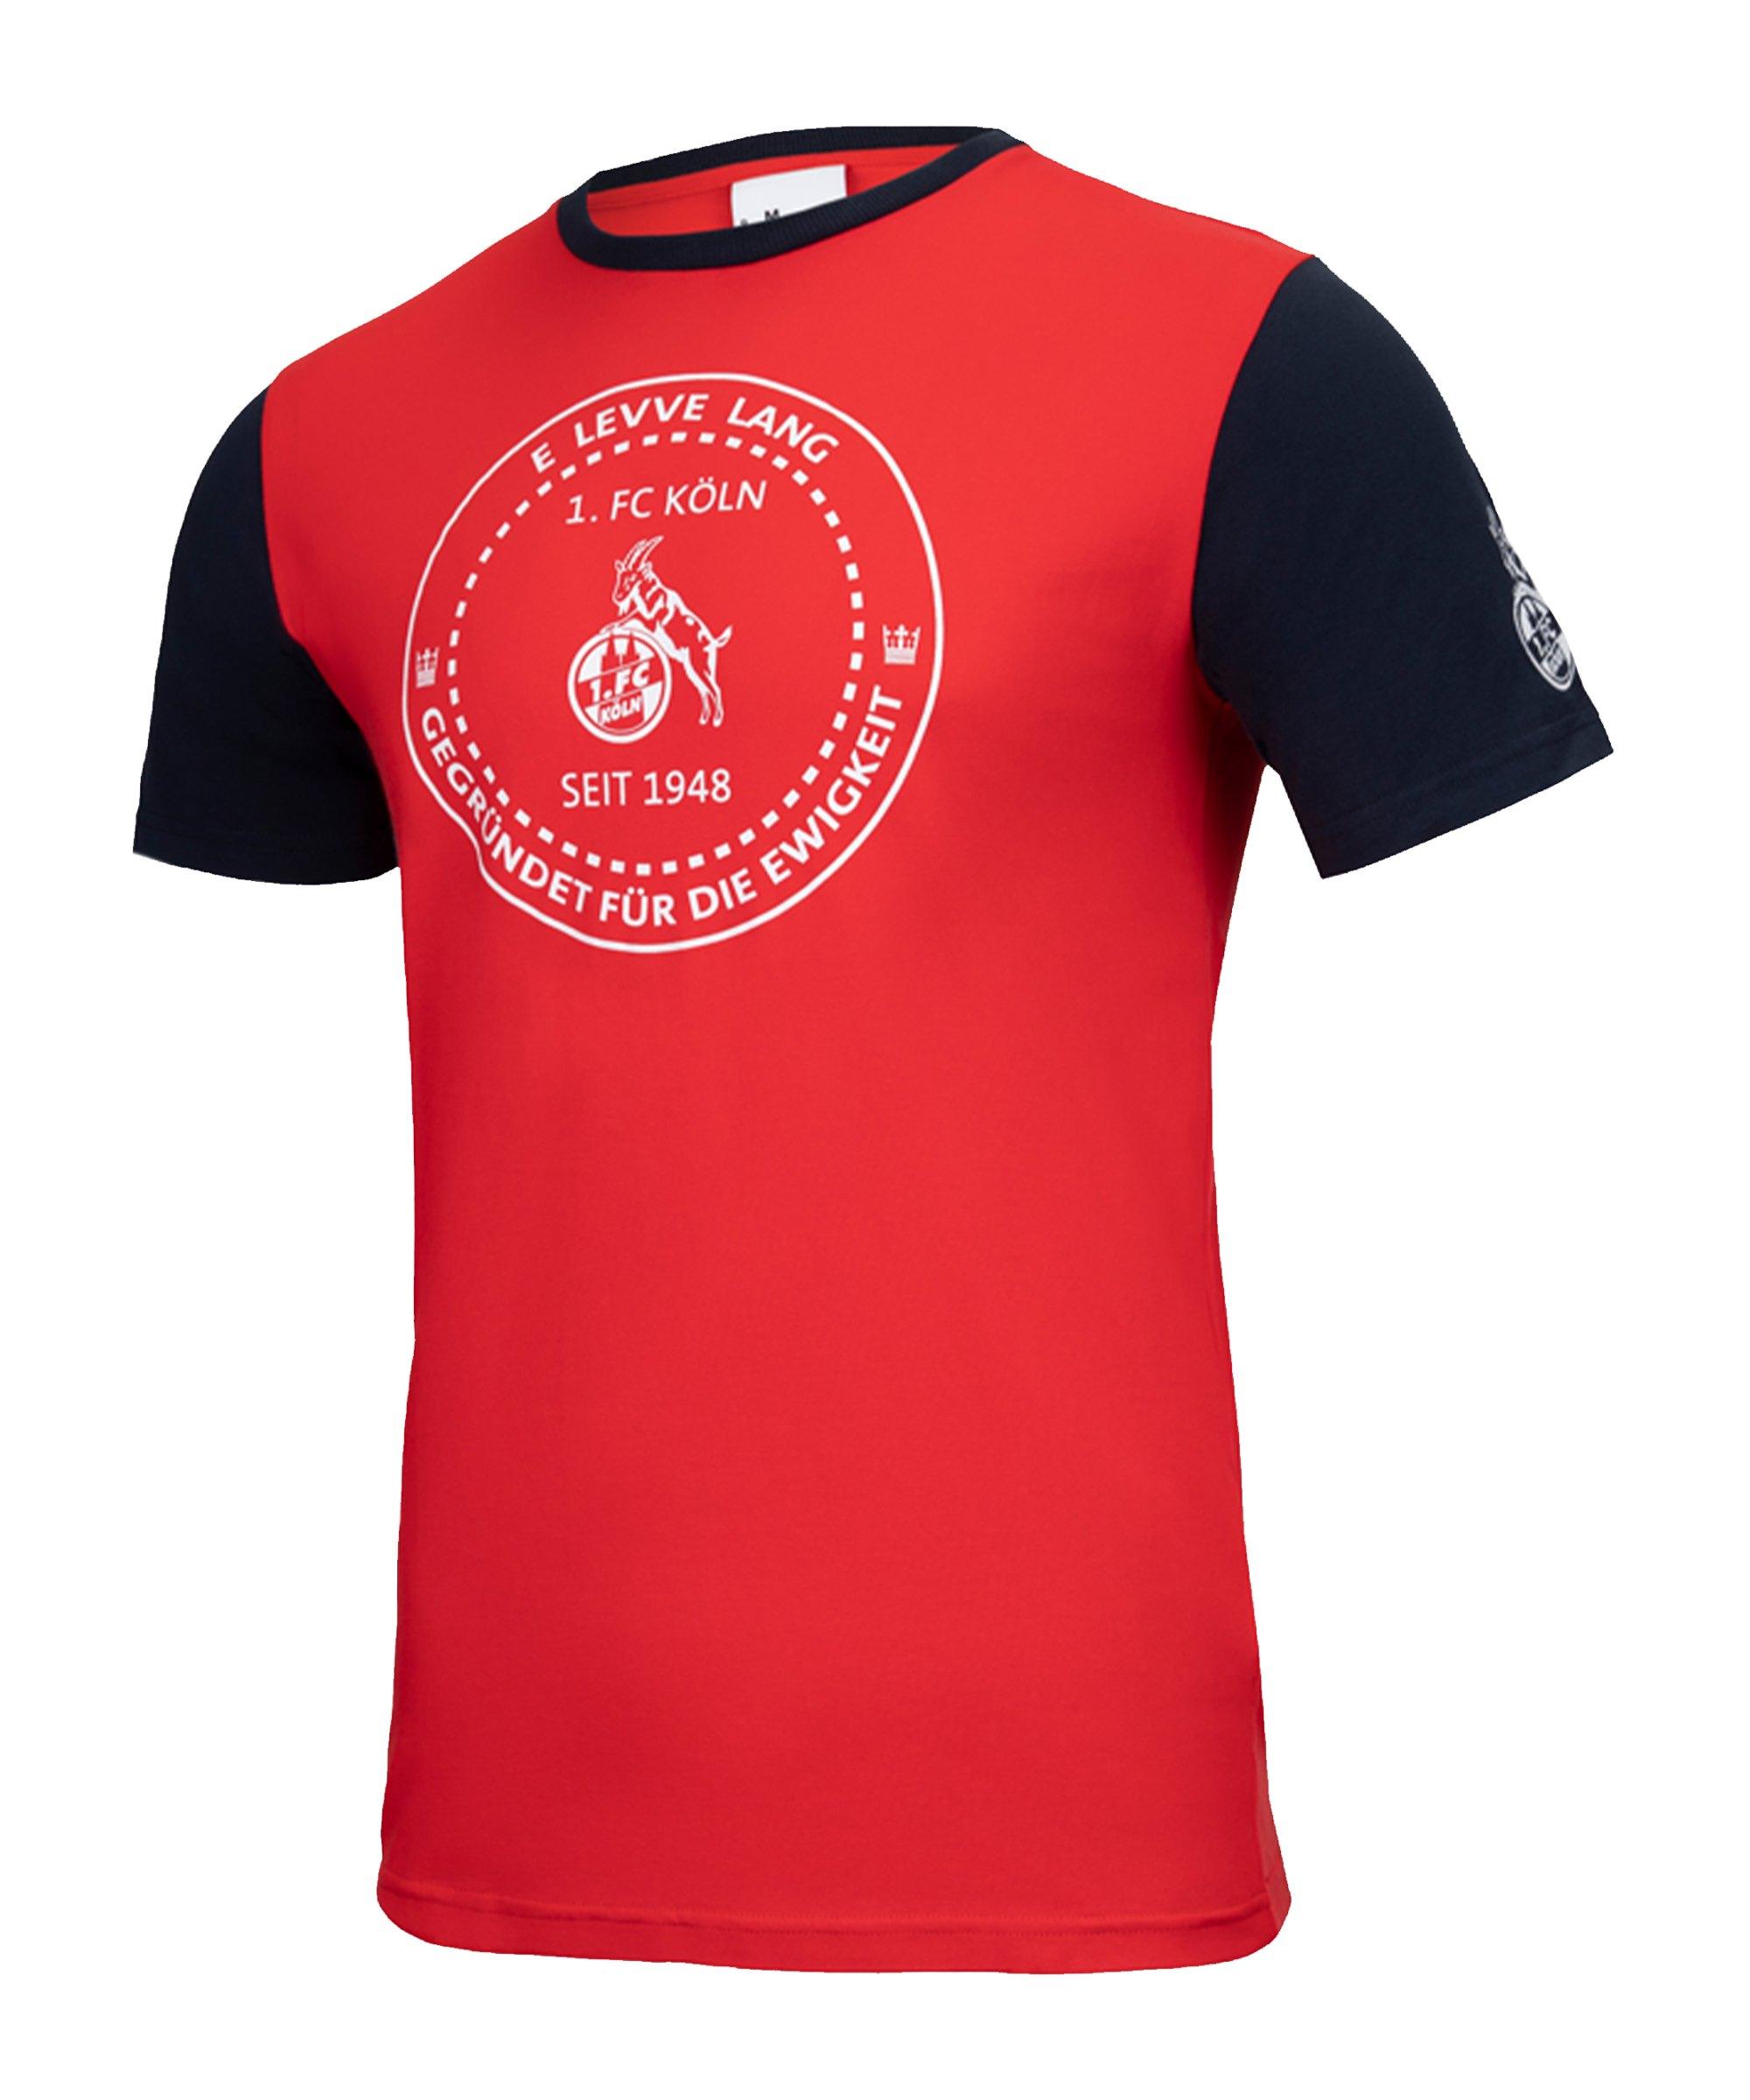 Uhlsport 1. FC Köln Xmas T-Shirt Rot - rot